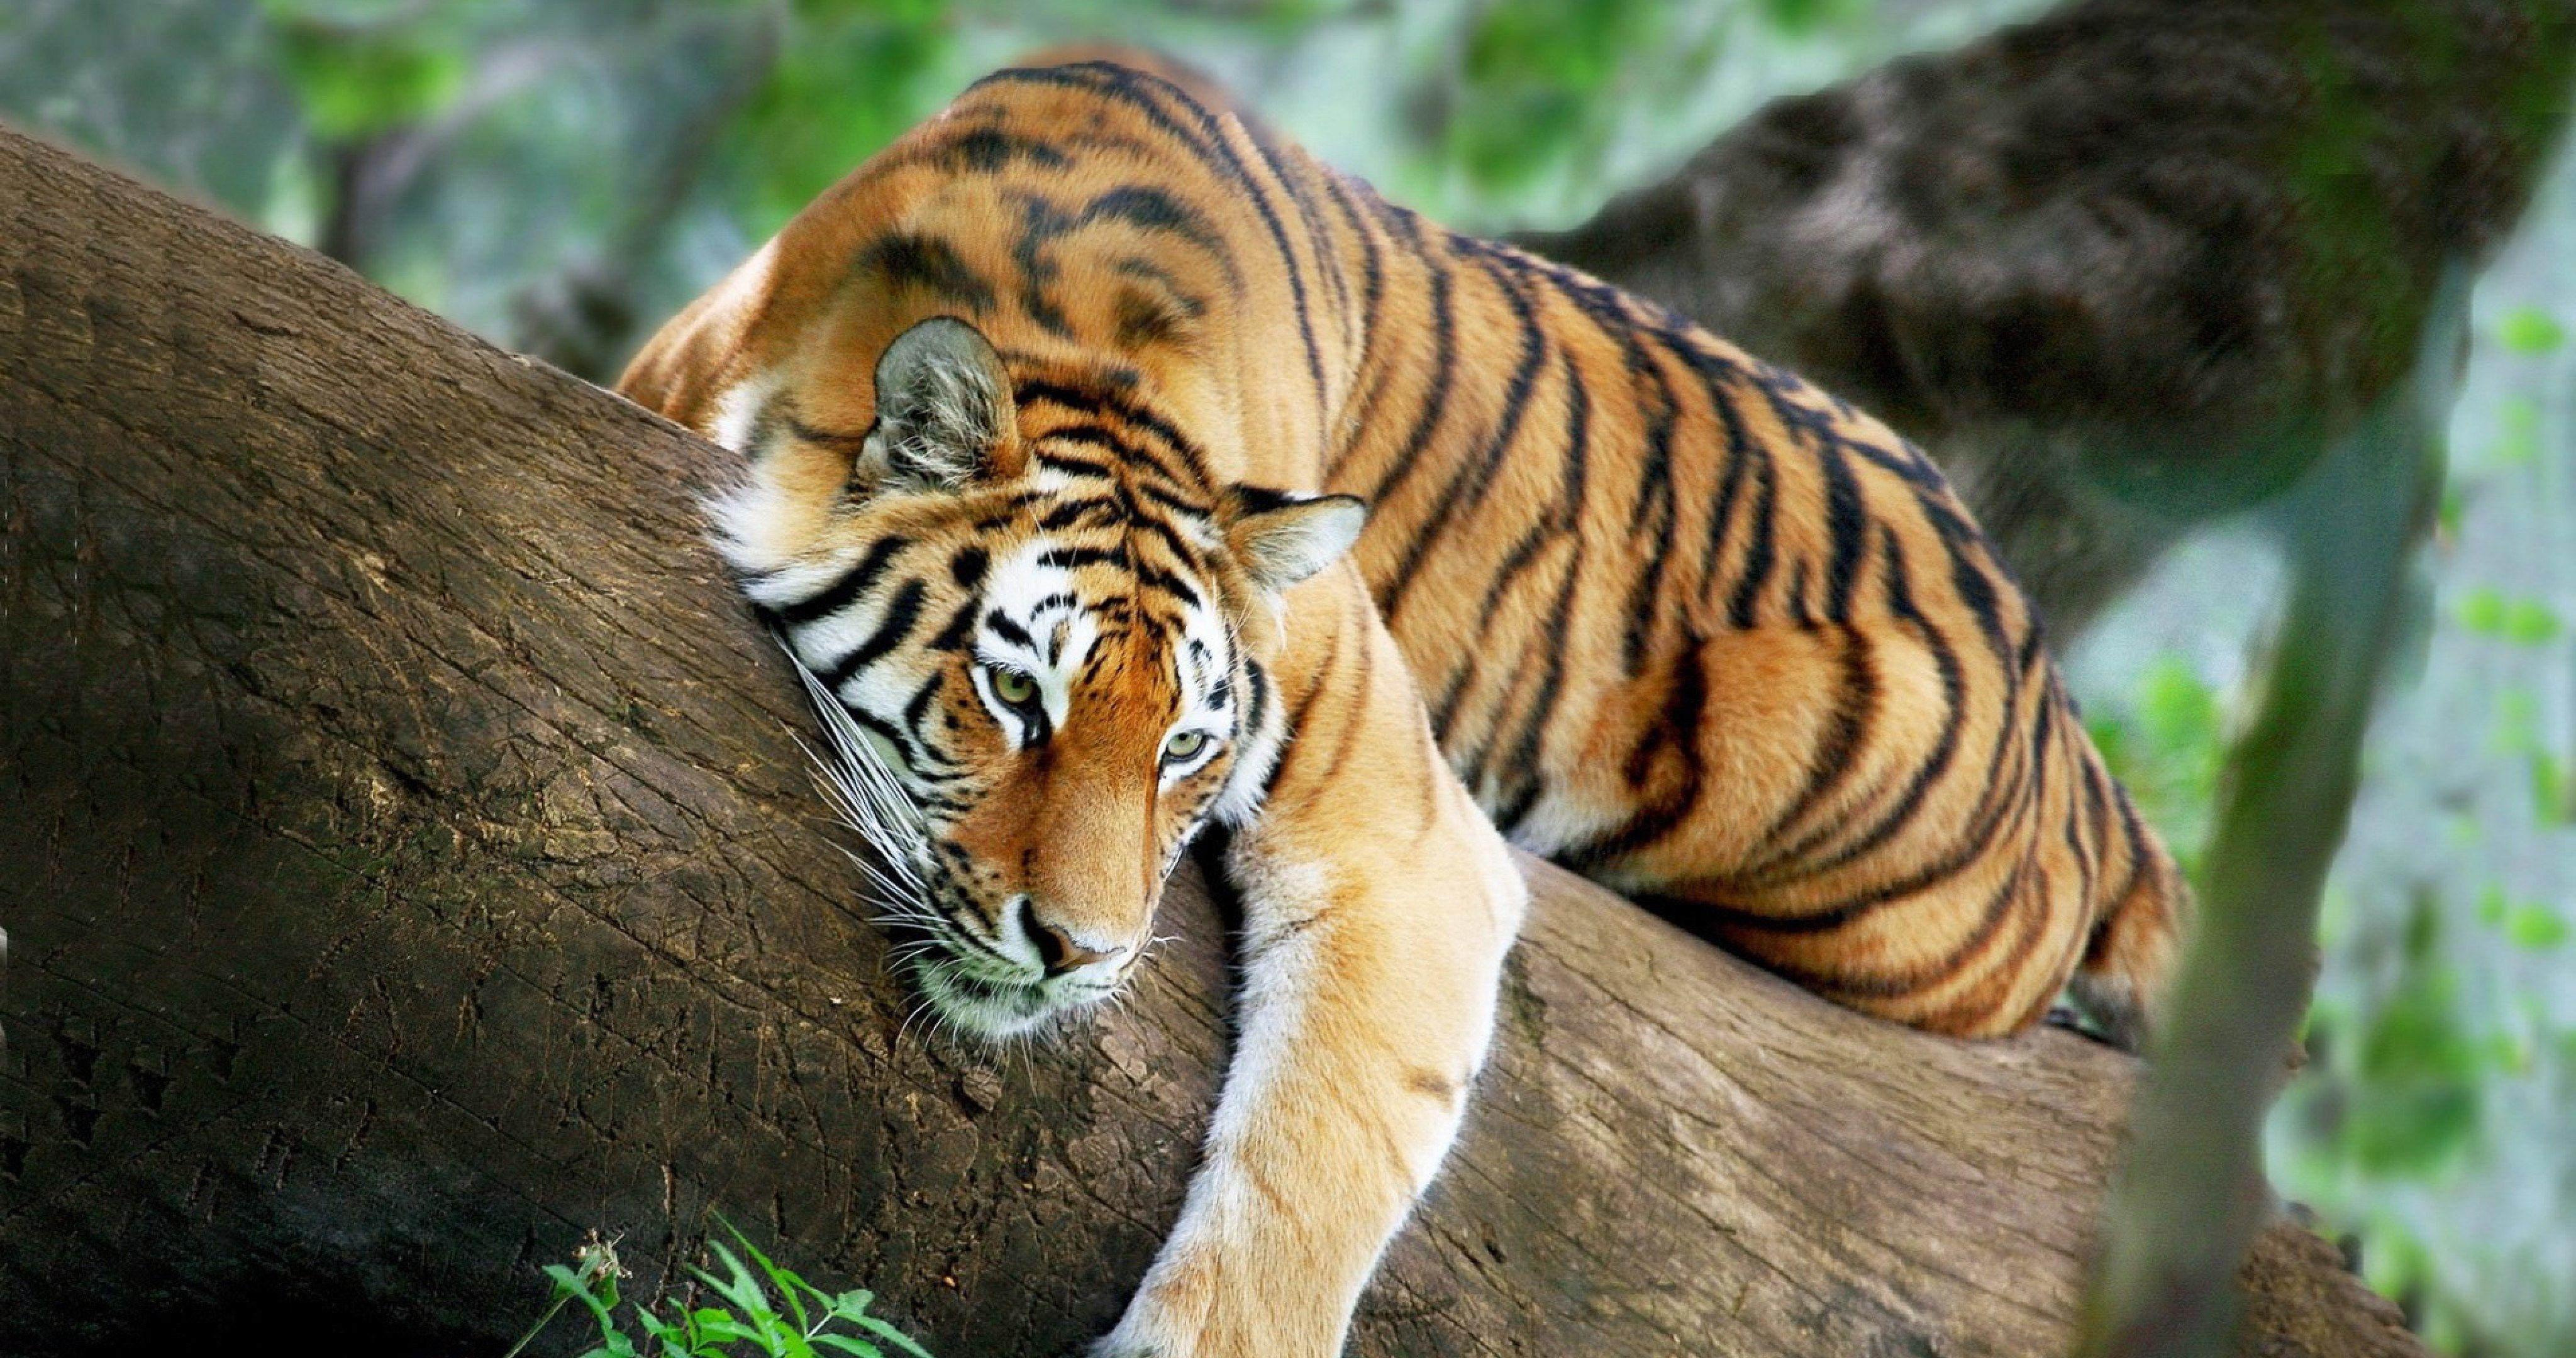 Tiger Recreation 4k Ultra Hd Wallpaper Wild Cats Animals Beautiful Animals Wild